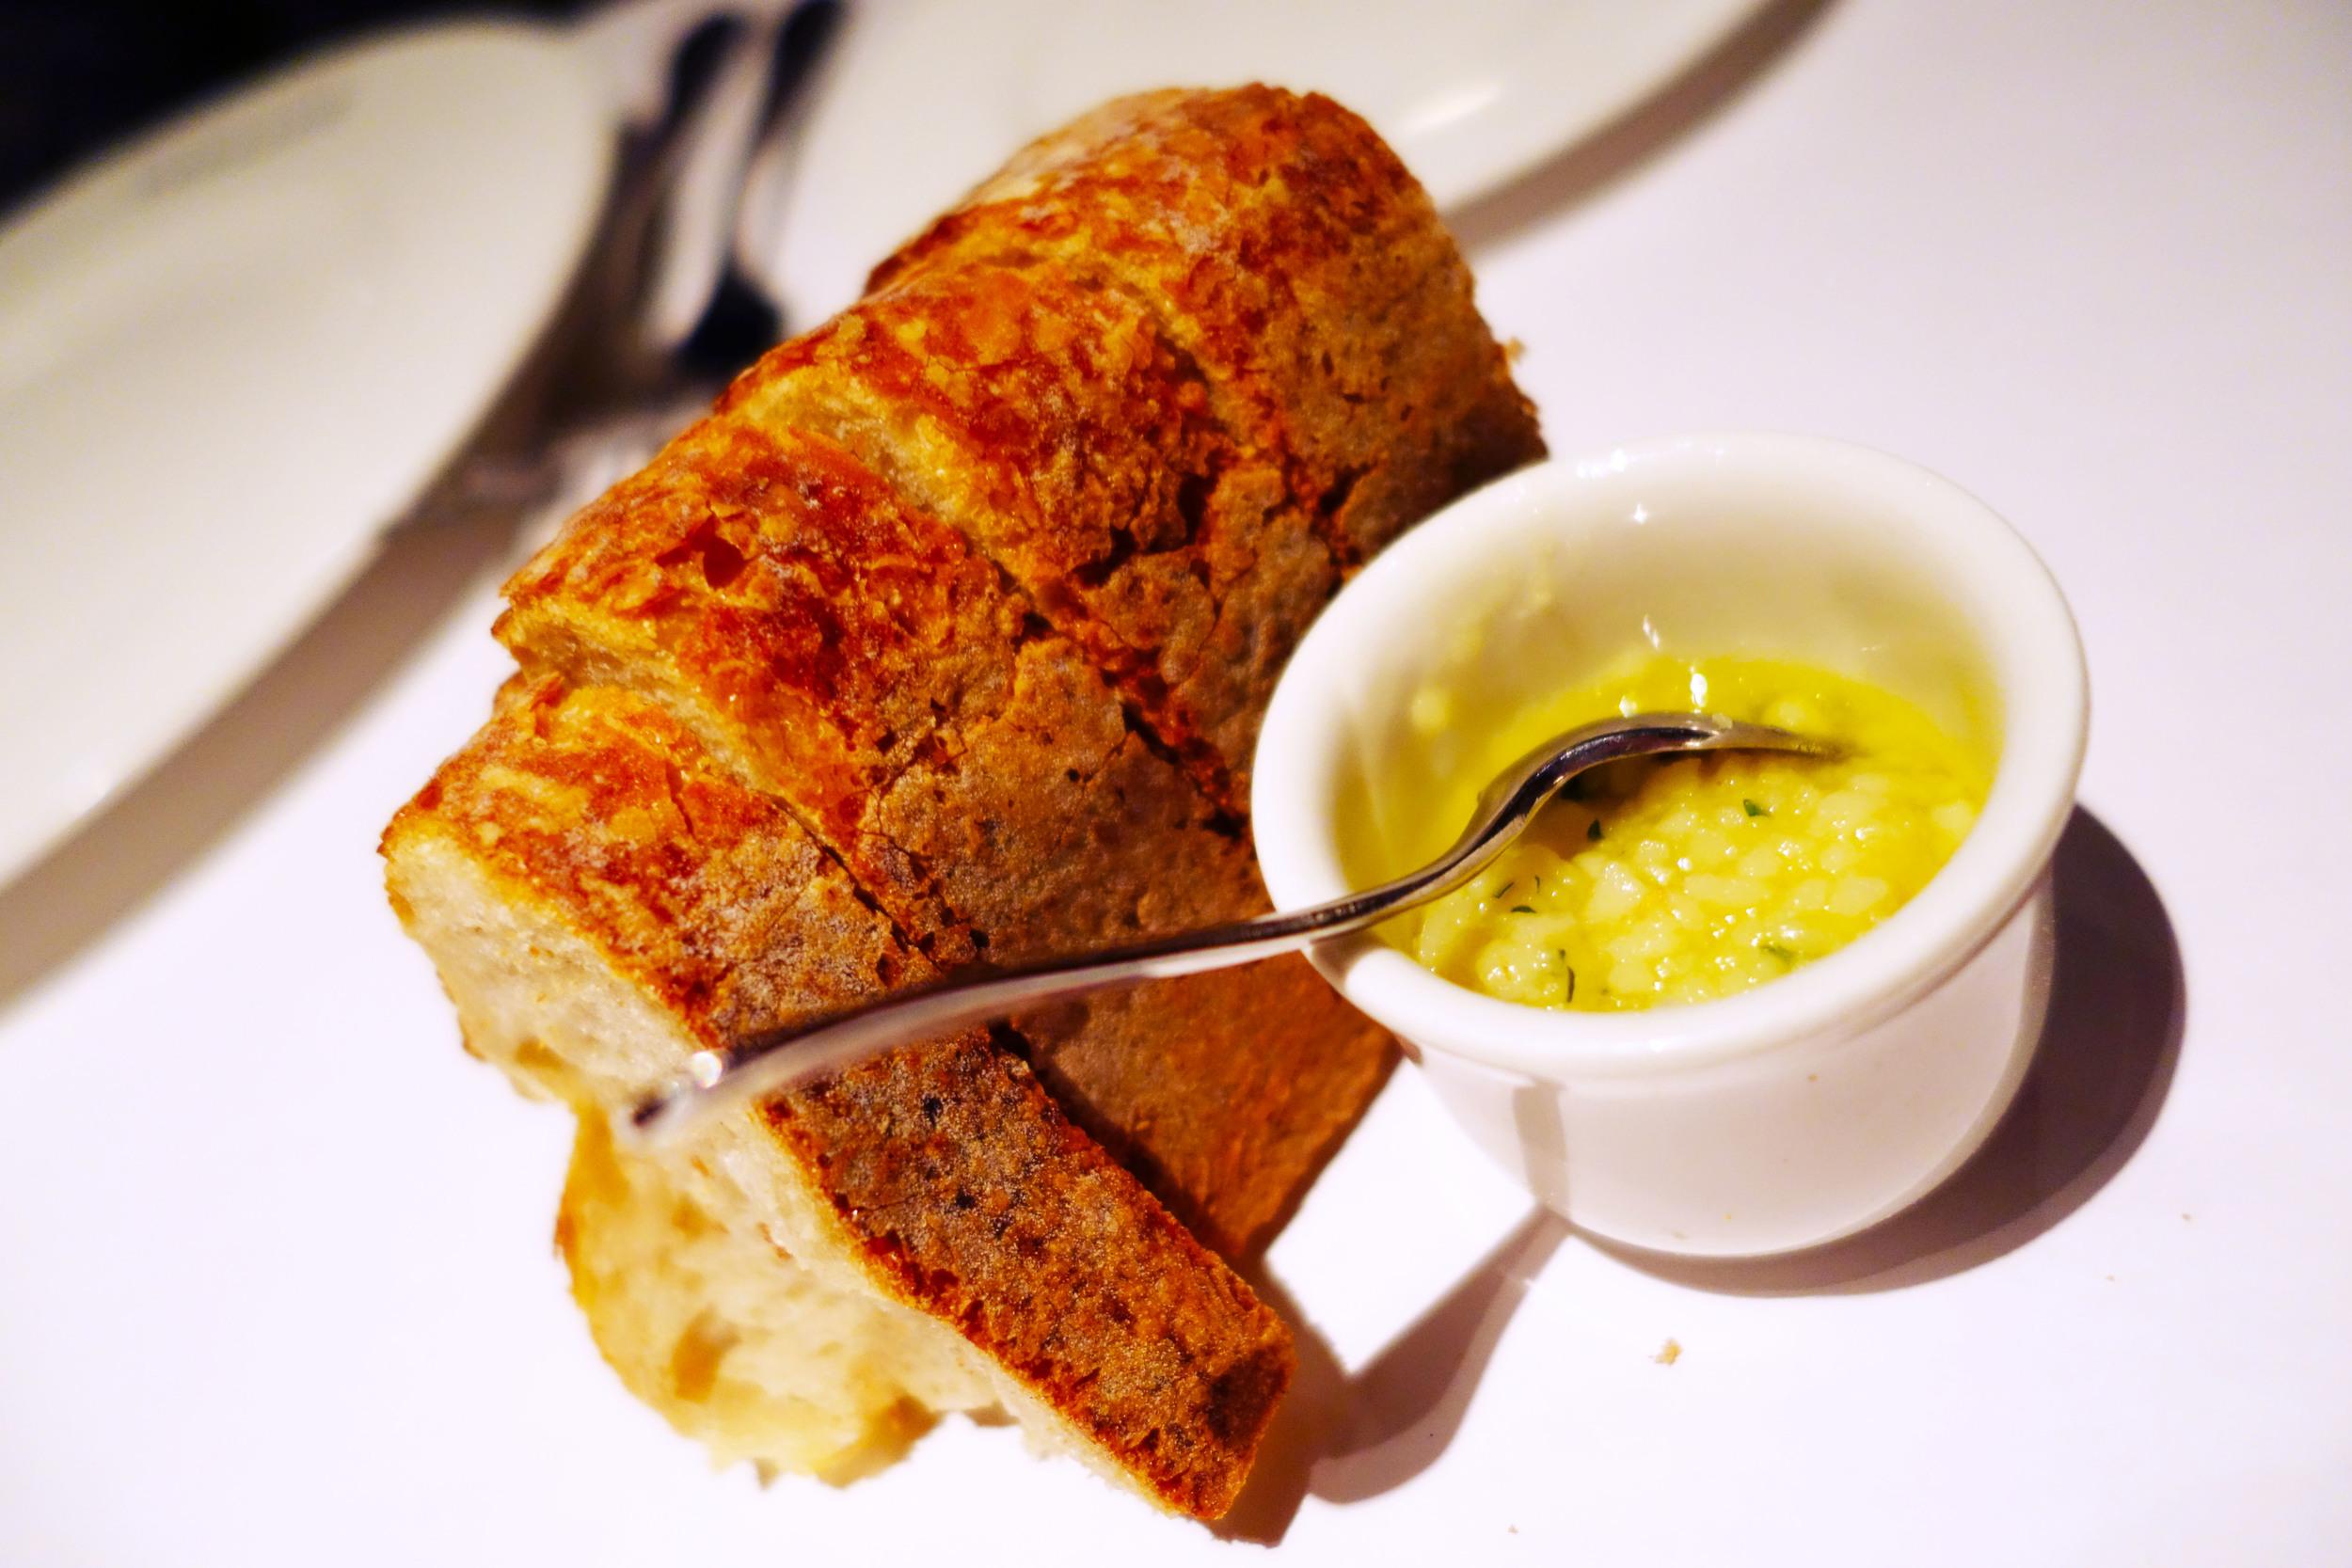 Bottega bread